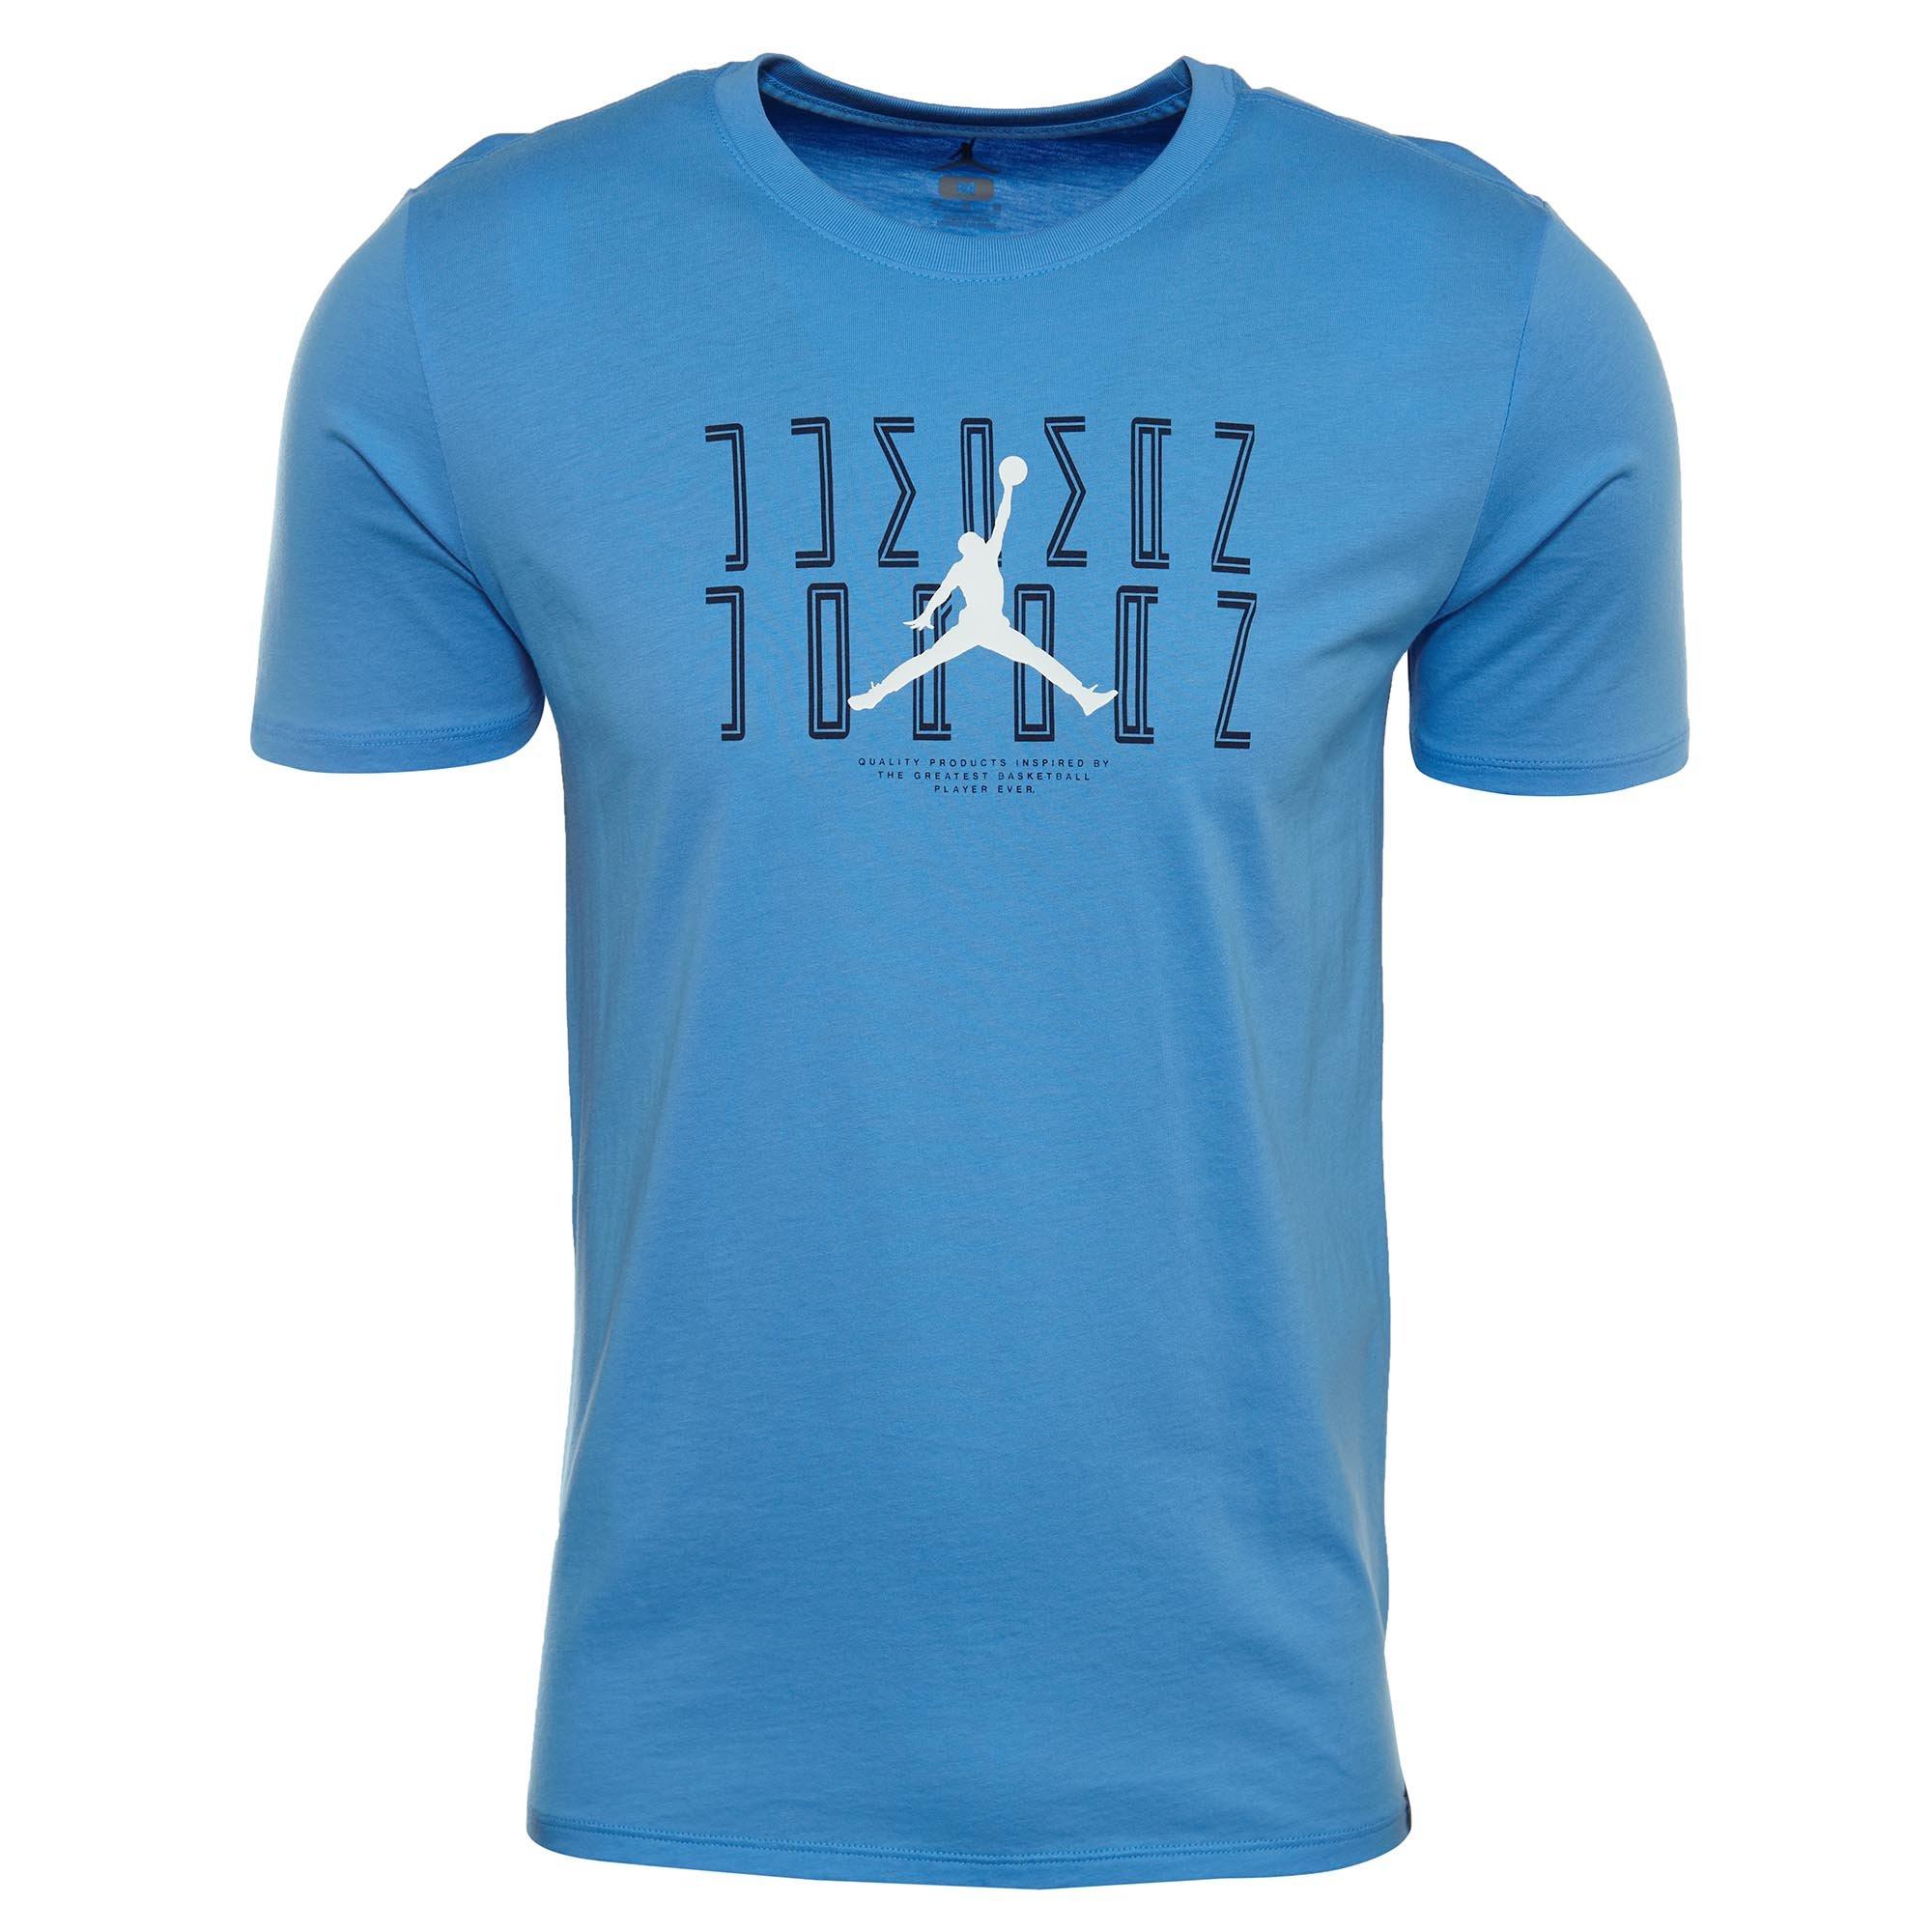 Jordan Men's Sportswear AJ 11 Graphic T-Shirt (University Blu/Mid Navy, L)